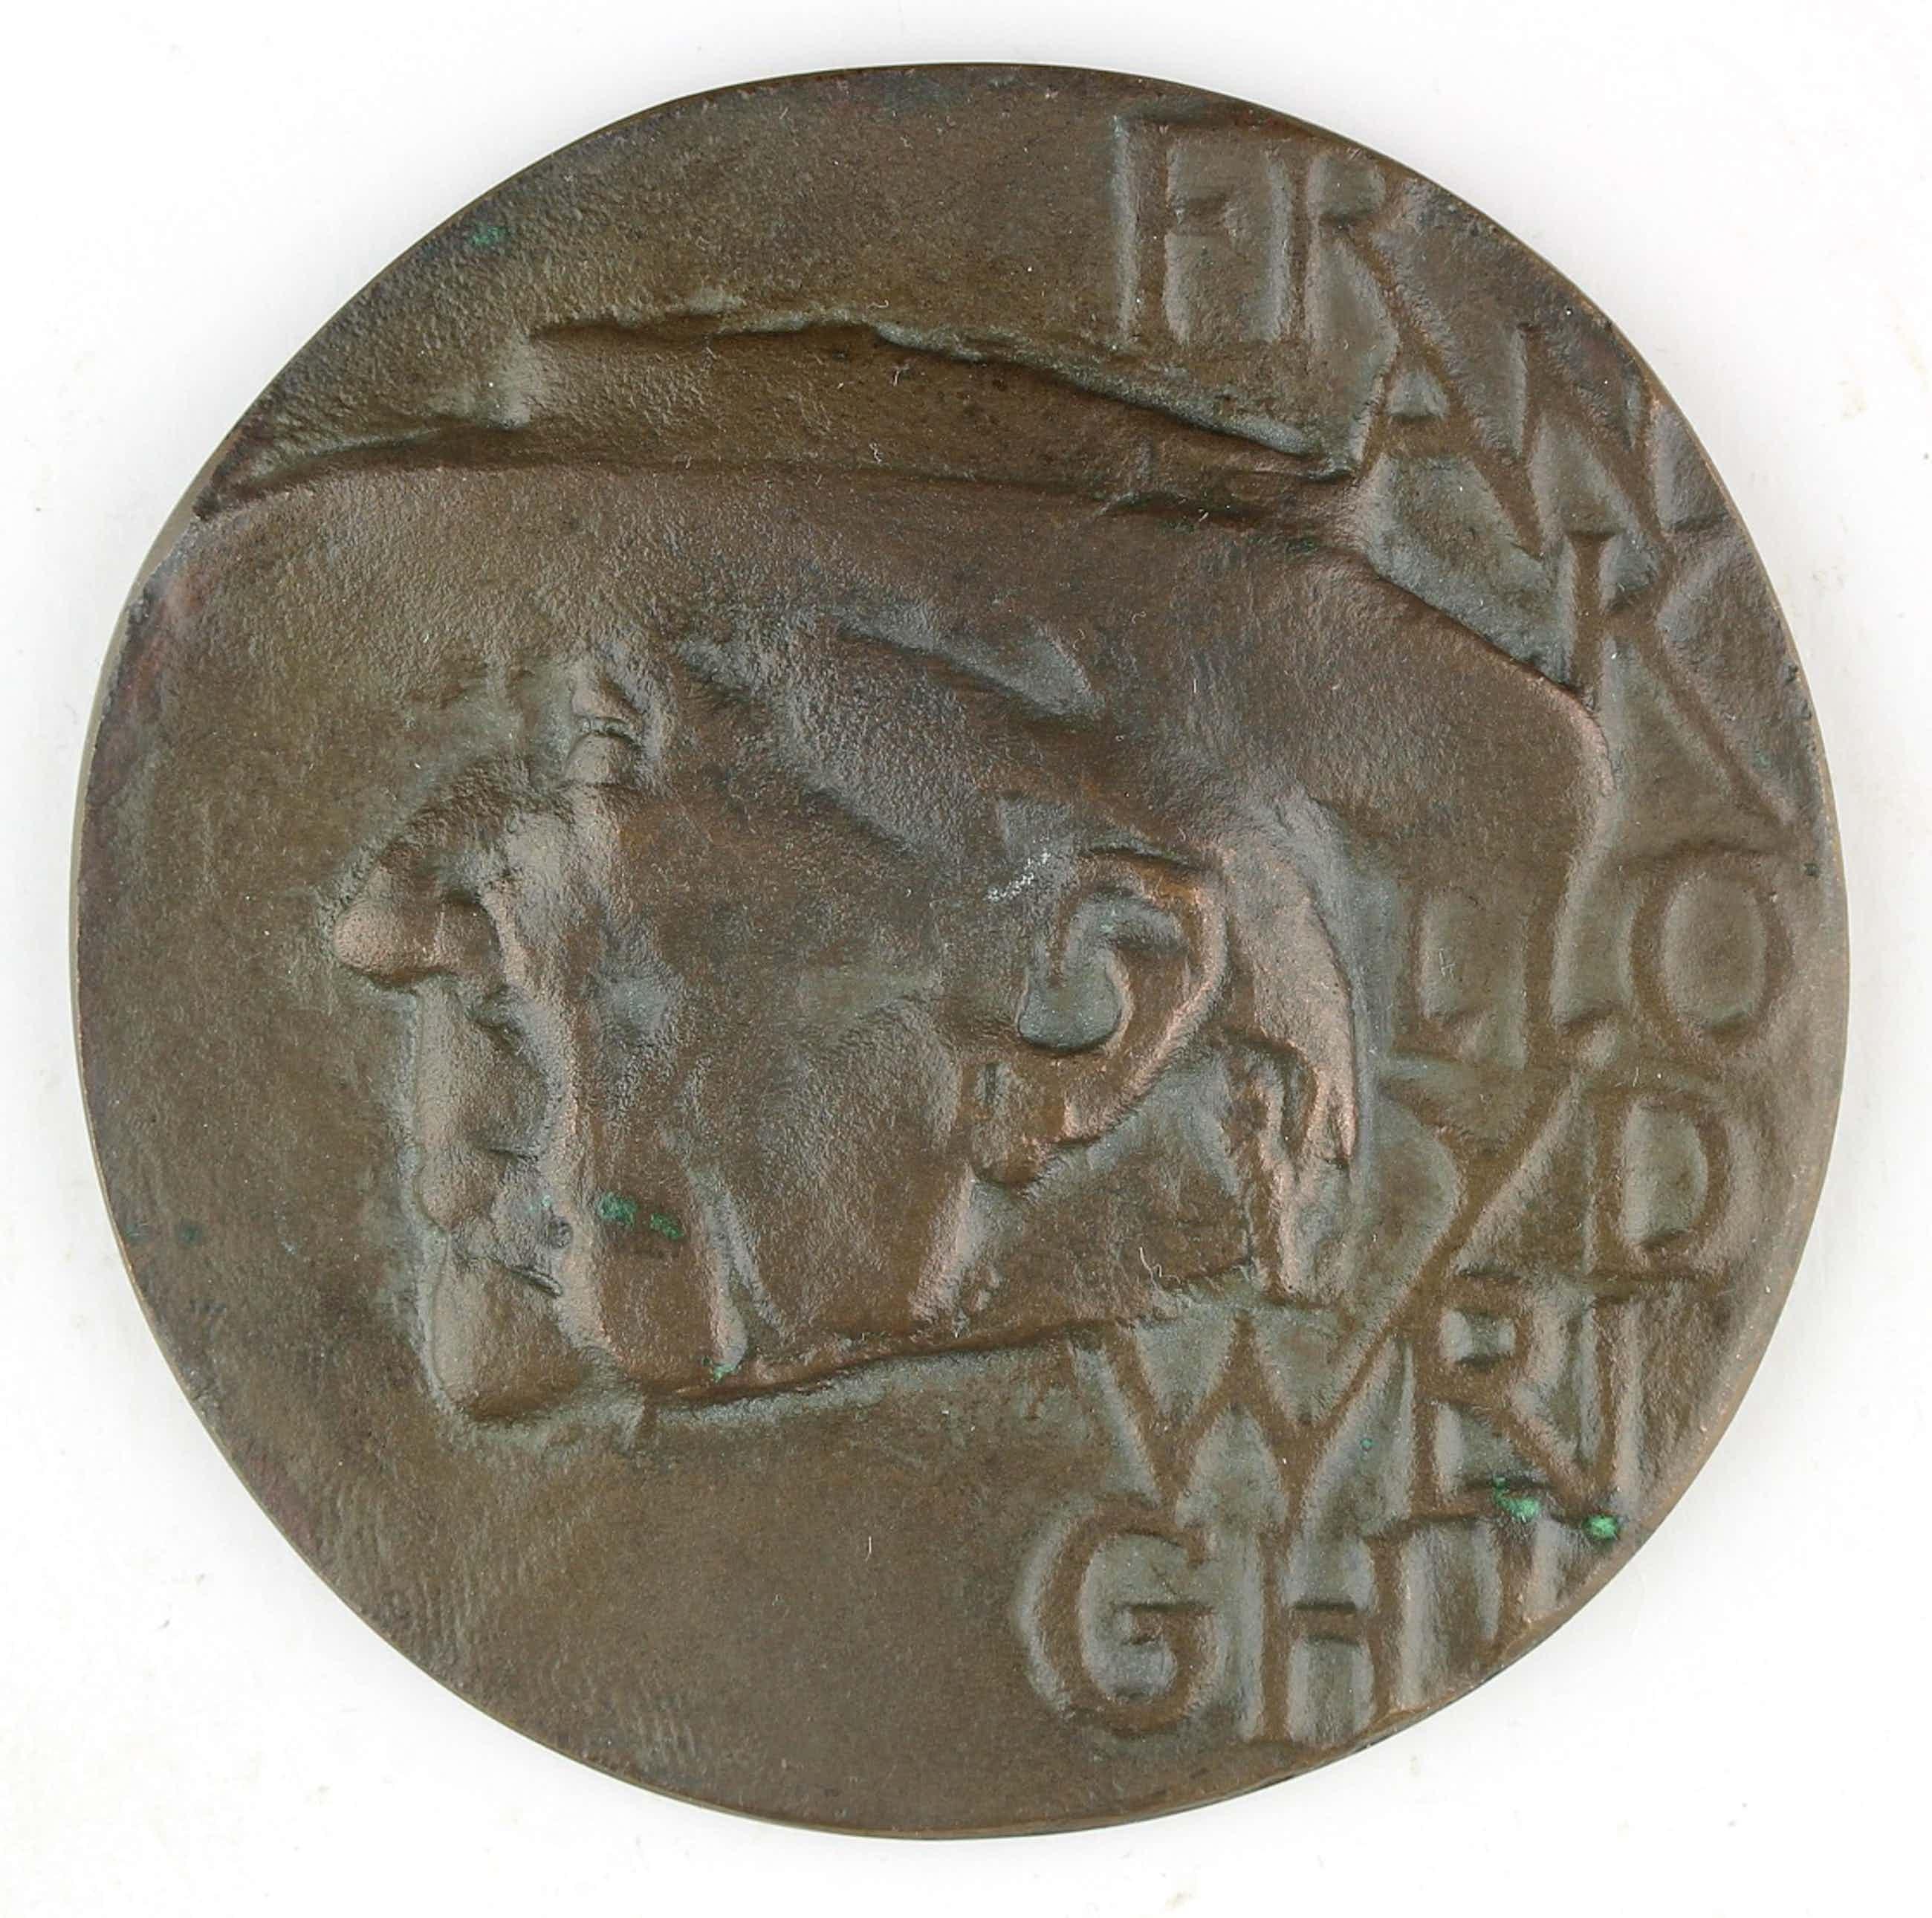 Eric Claus - Bronzen penning: Frank Lloyd Wright, 1963 kopen? Bied vanaf 120!